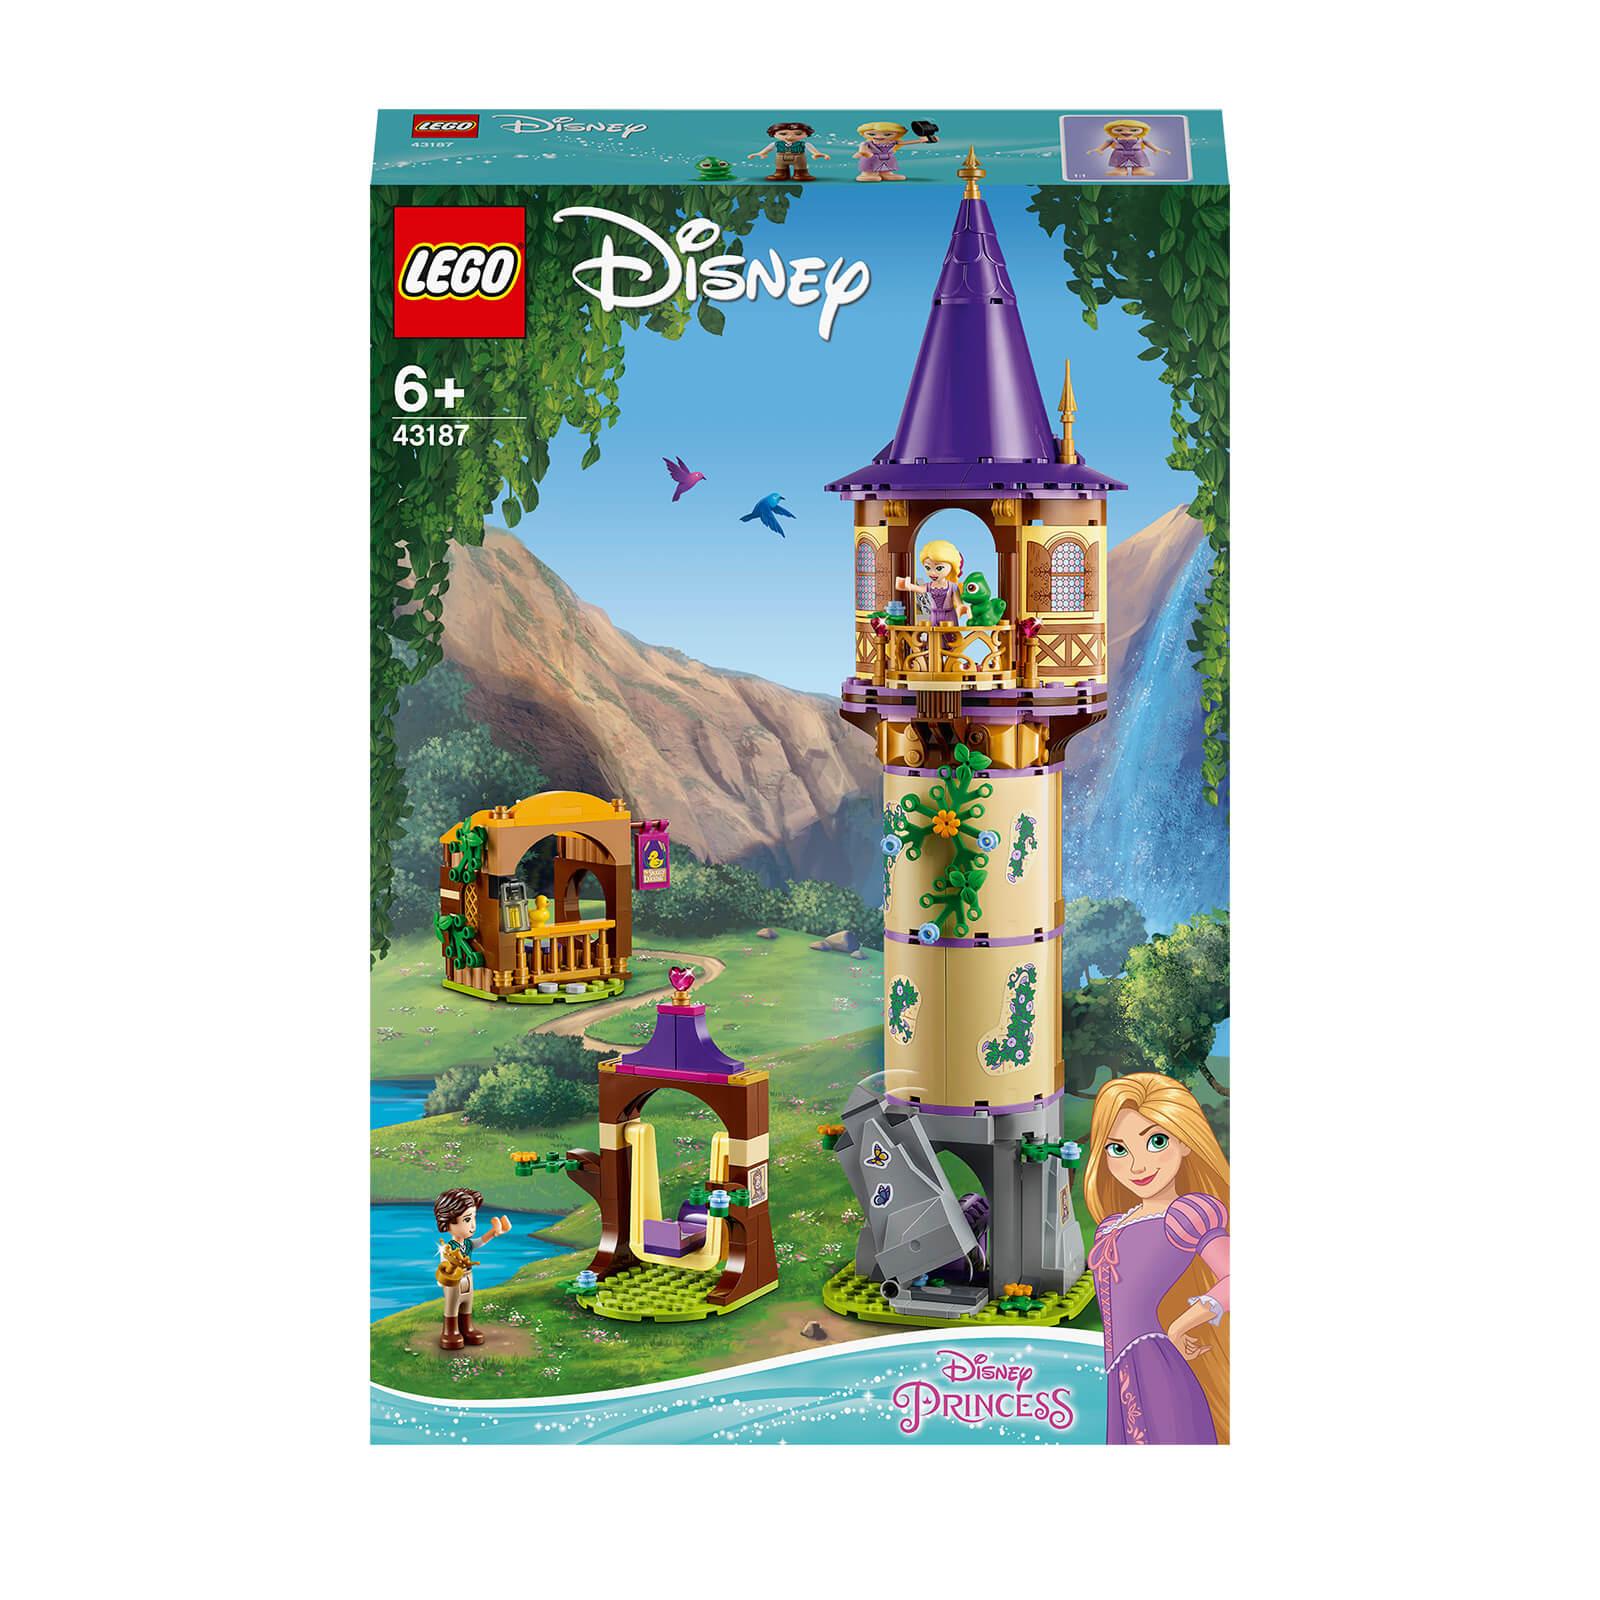 LEGO Disney Princess: Rapunzel�s Tower Playset (43187)